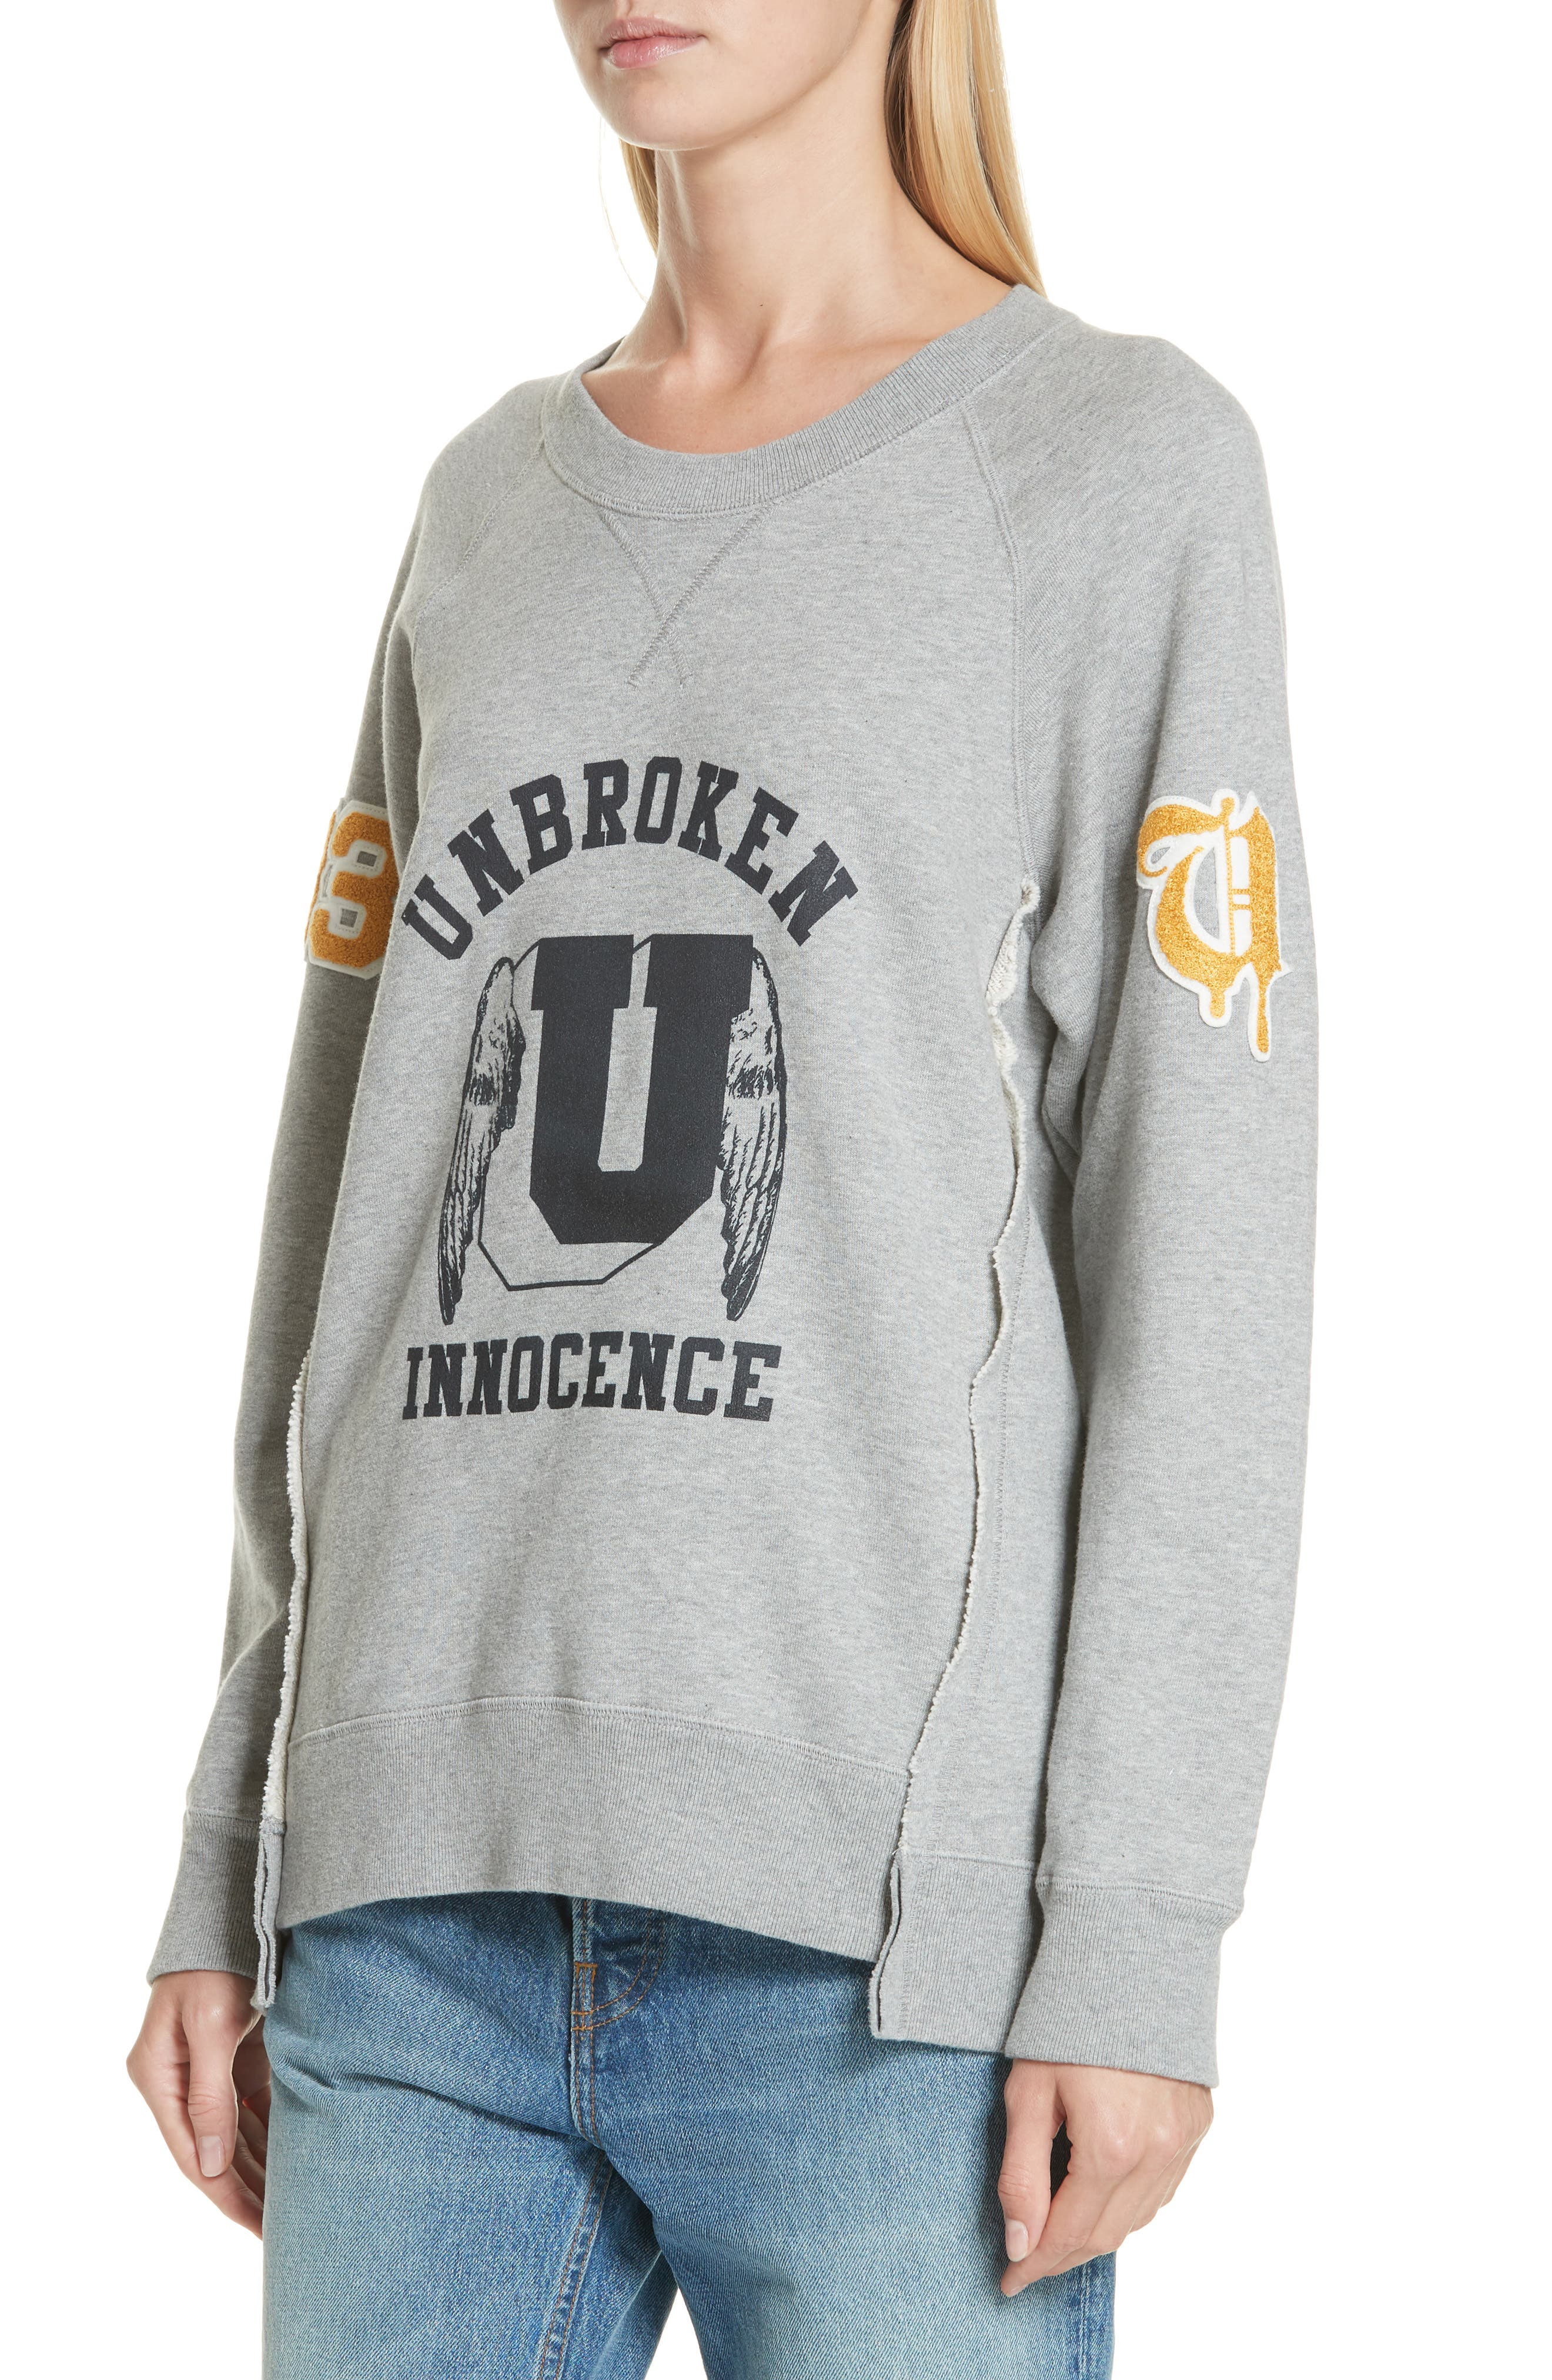 Unbroken Innocence Sweatshirt,                             Alternate thumbnail 4, color,                             B TOP GRAY